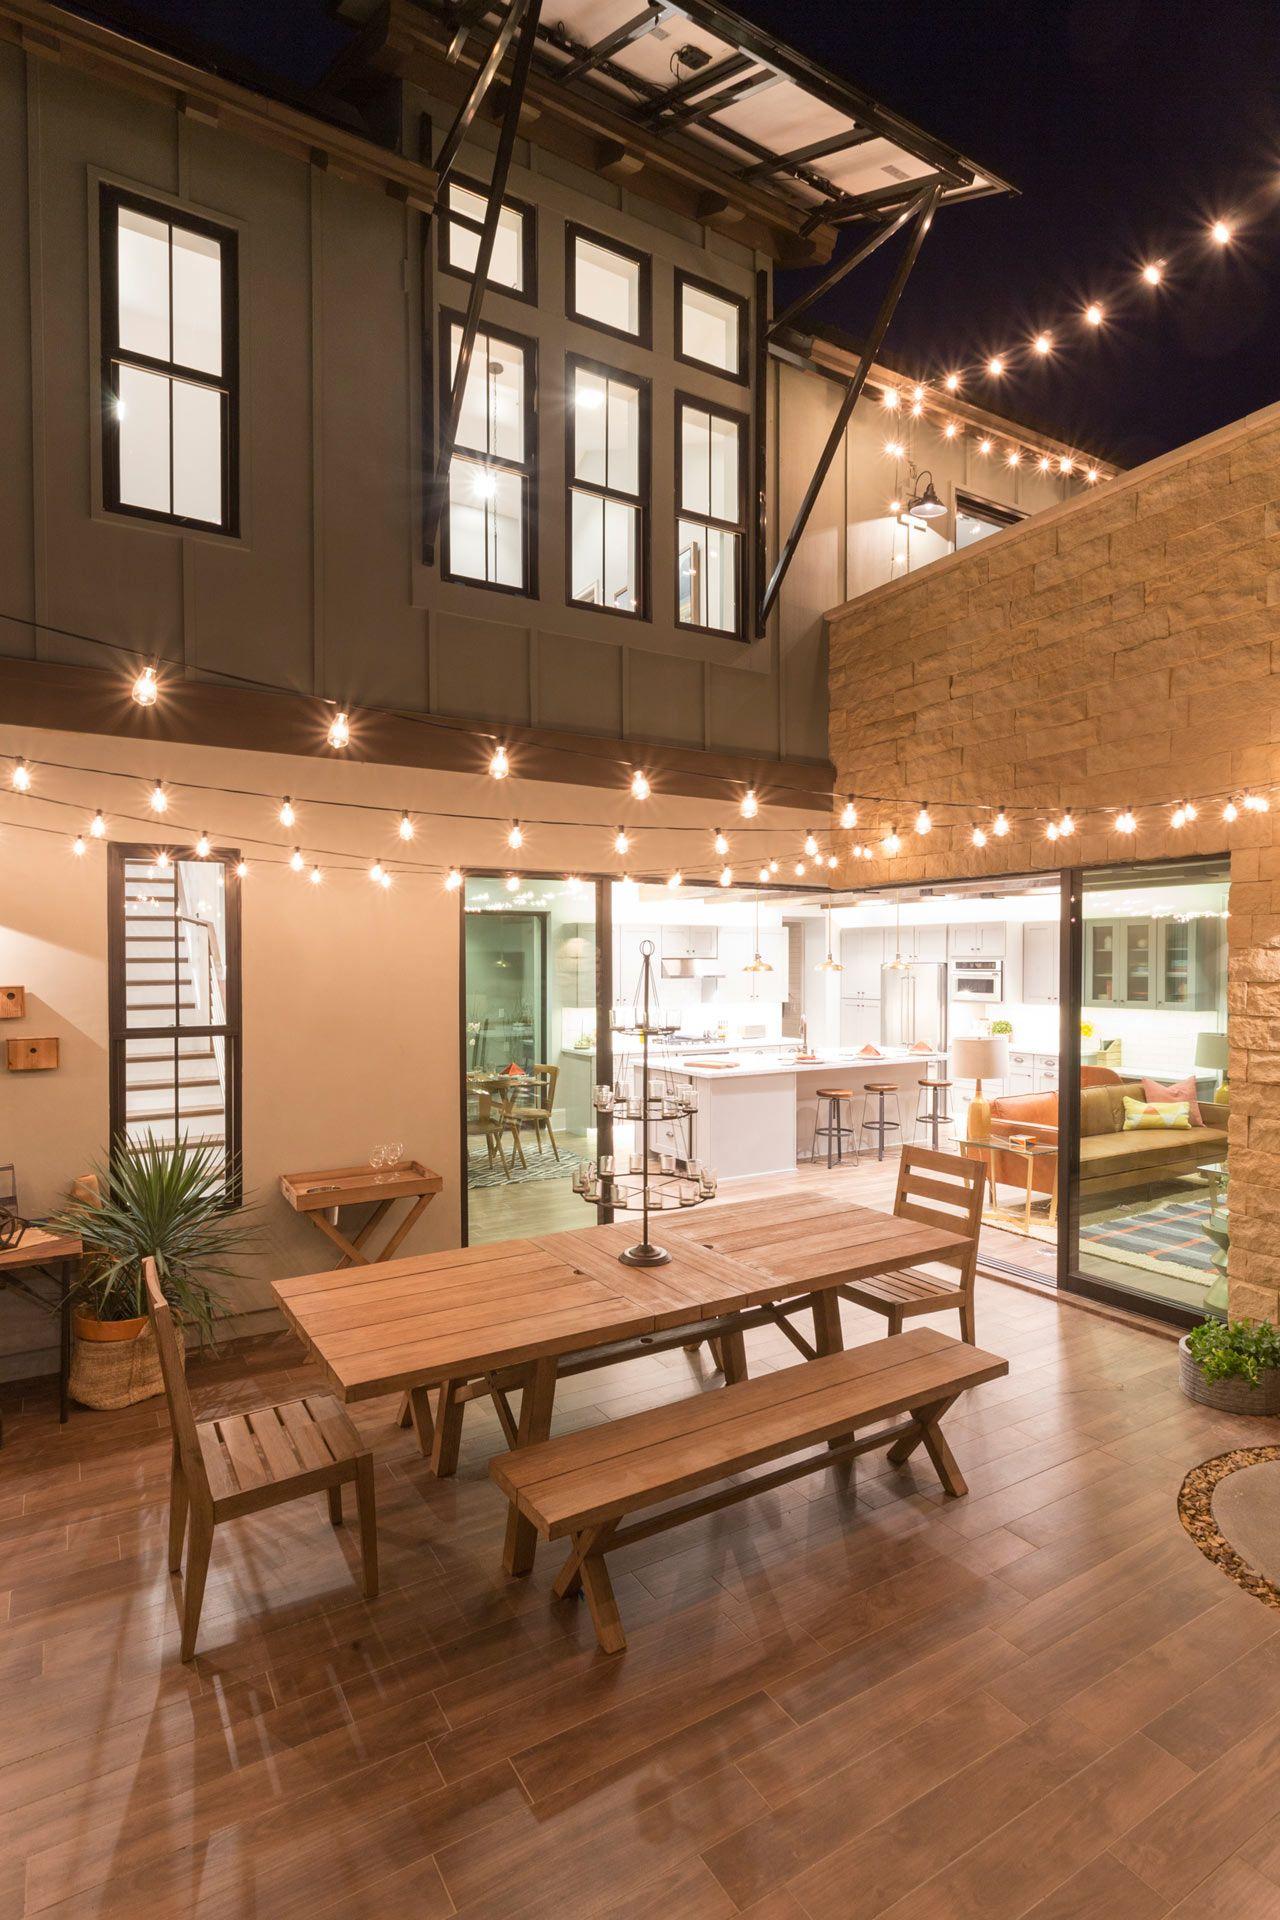 Responsive-Home-millennials-contemporary-farmhouse-4 ...